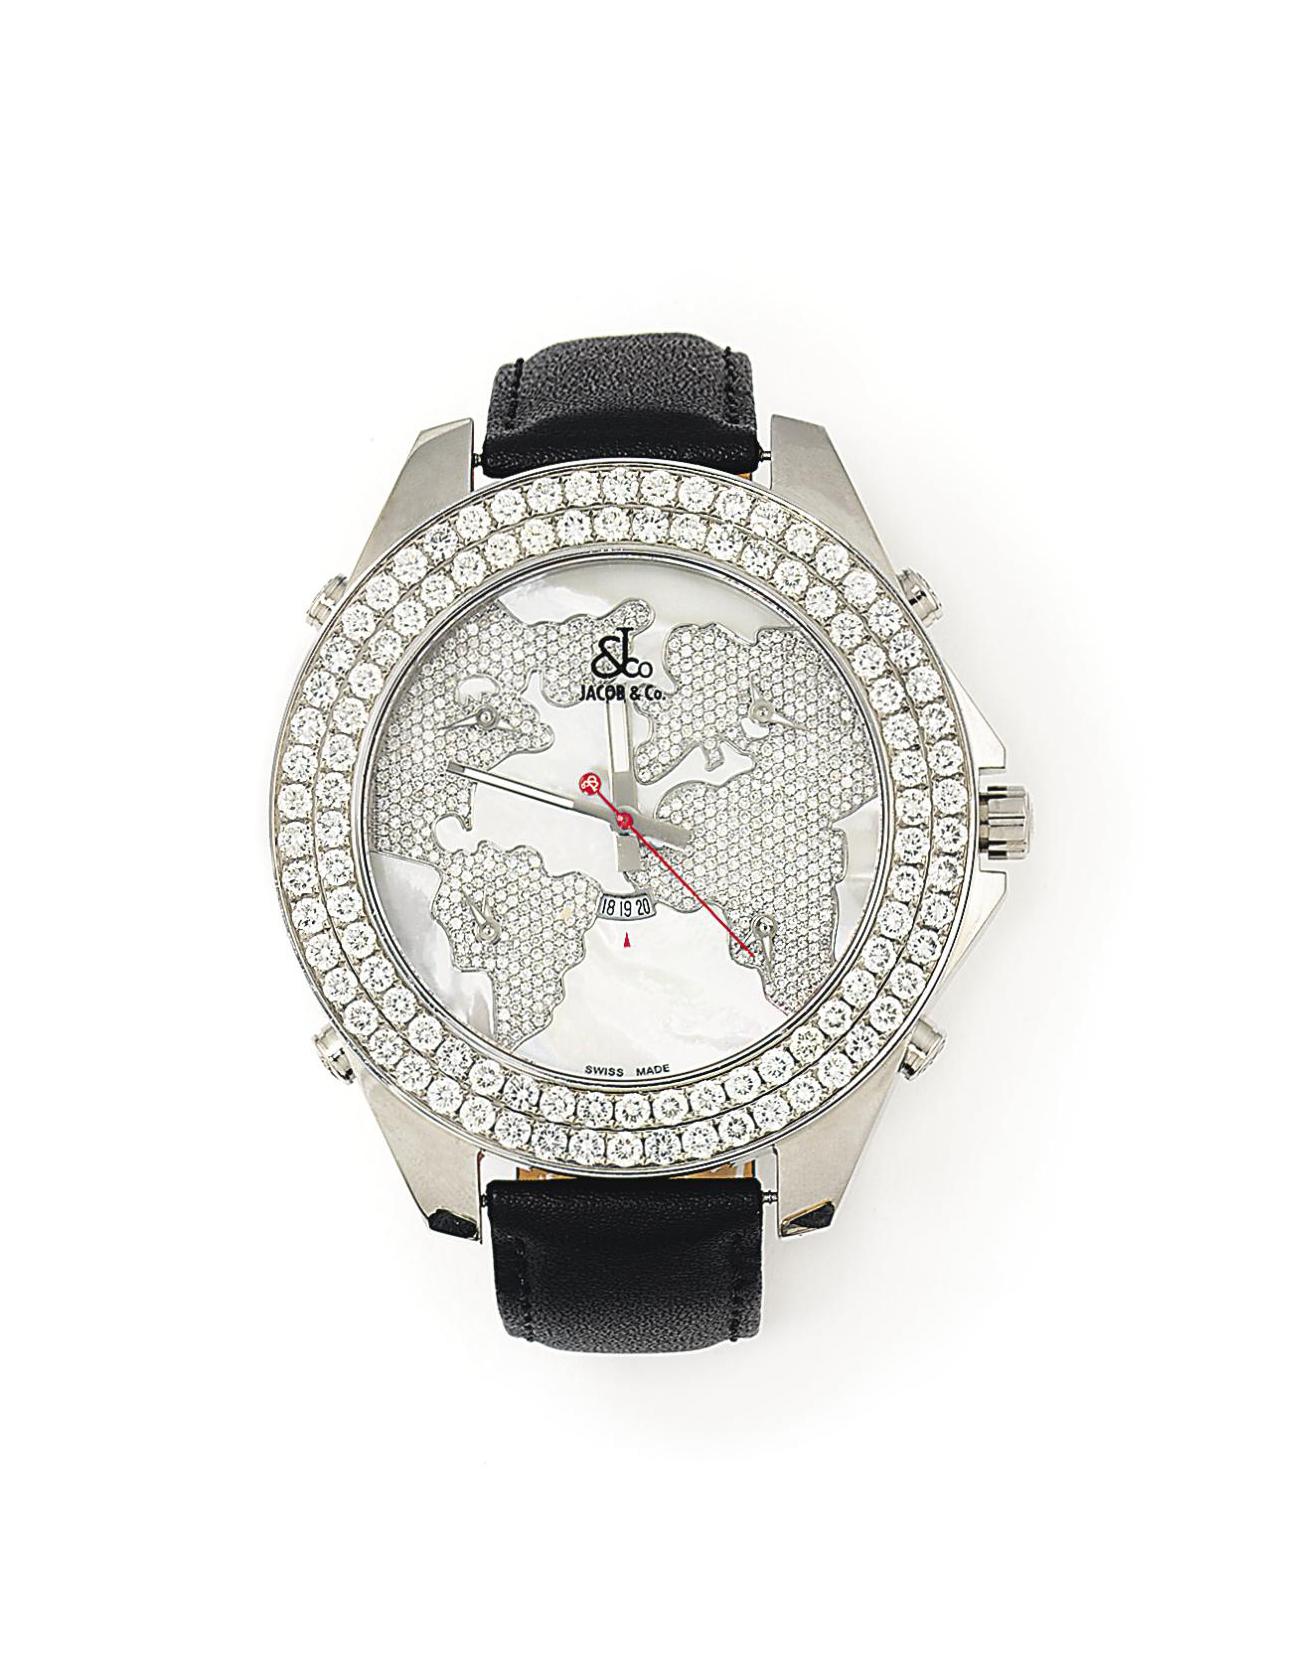 A DIAMOND-SET, STAINLESS STEEL FIVE TIME ZONE 'JUMBO' QUARTZ WRISTWATCH, BY JACOB & CO.